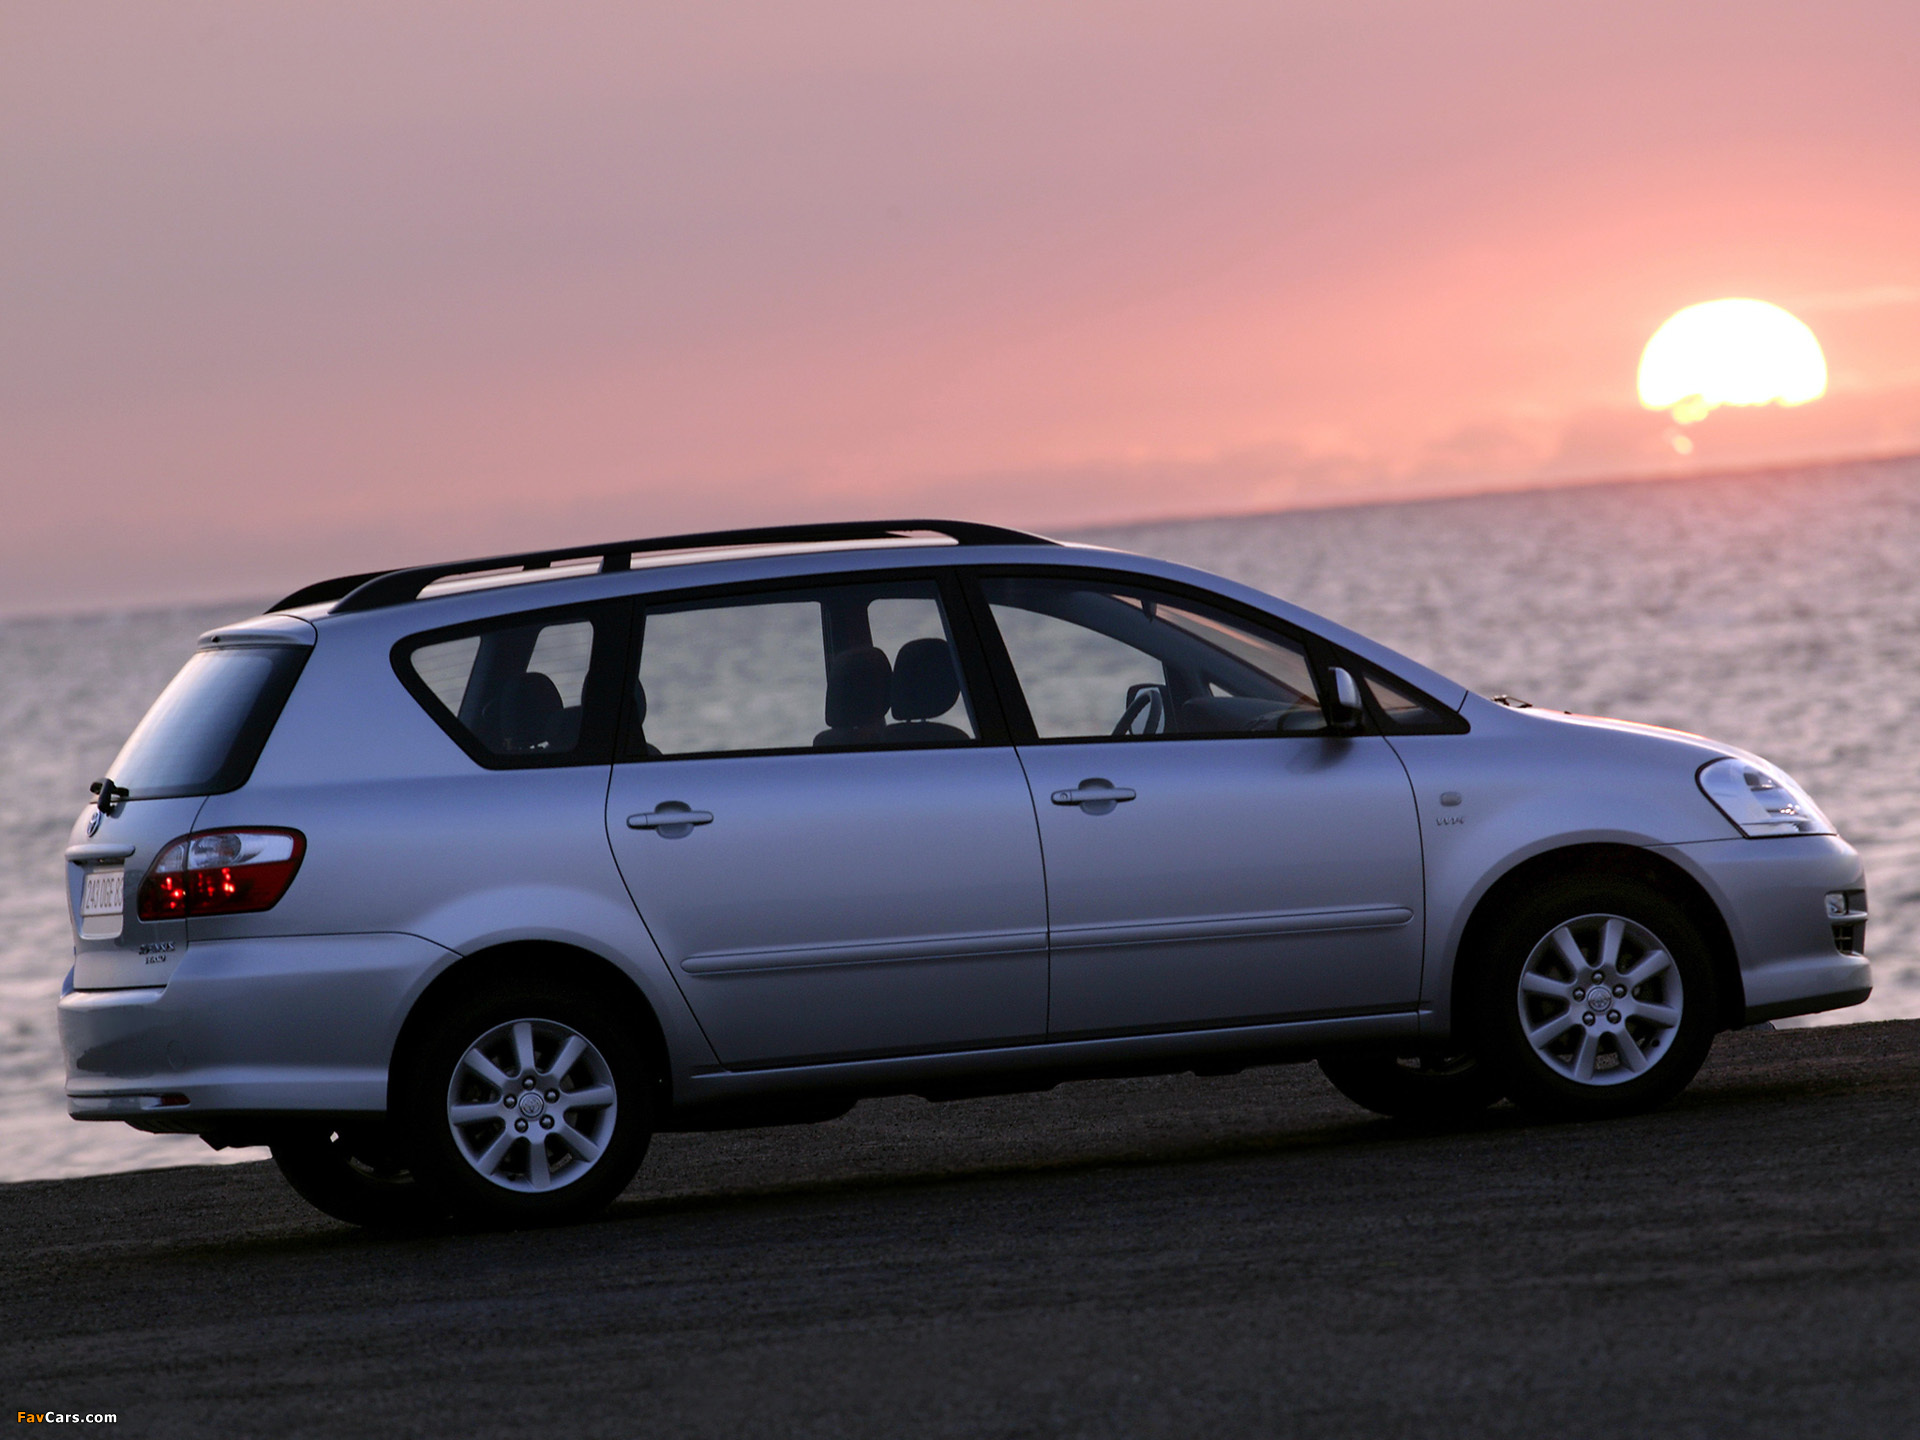 Toyota Avensis Tests & Erfahrungen - autoplenum.de